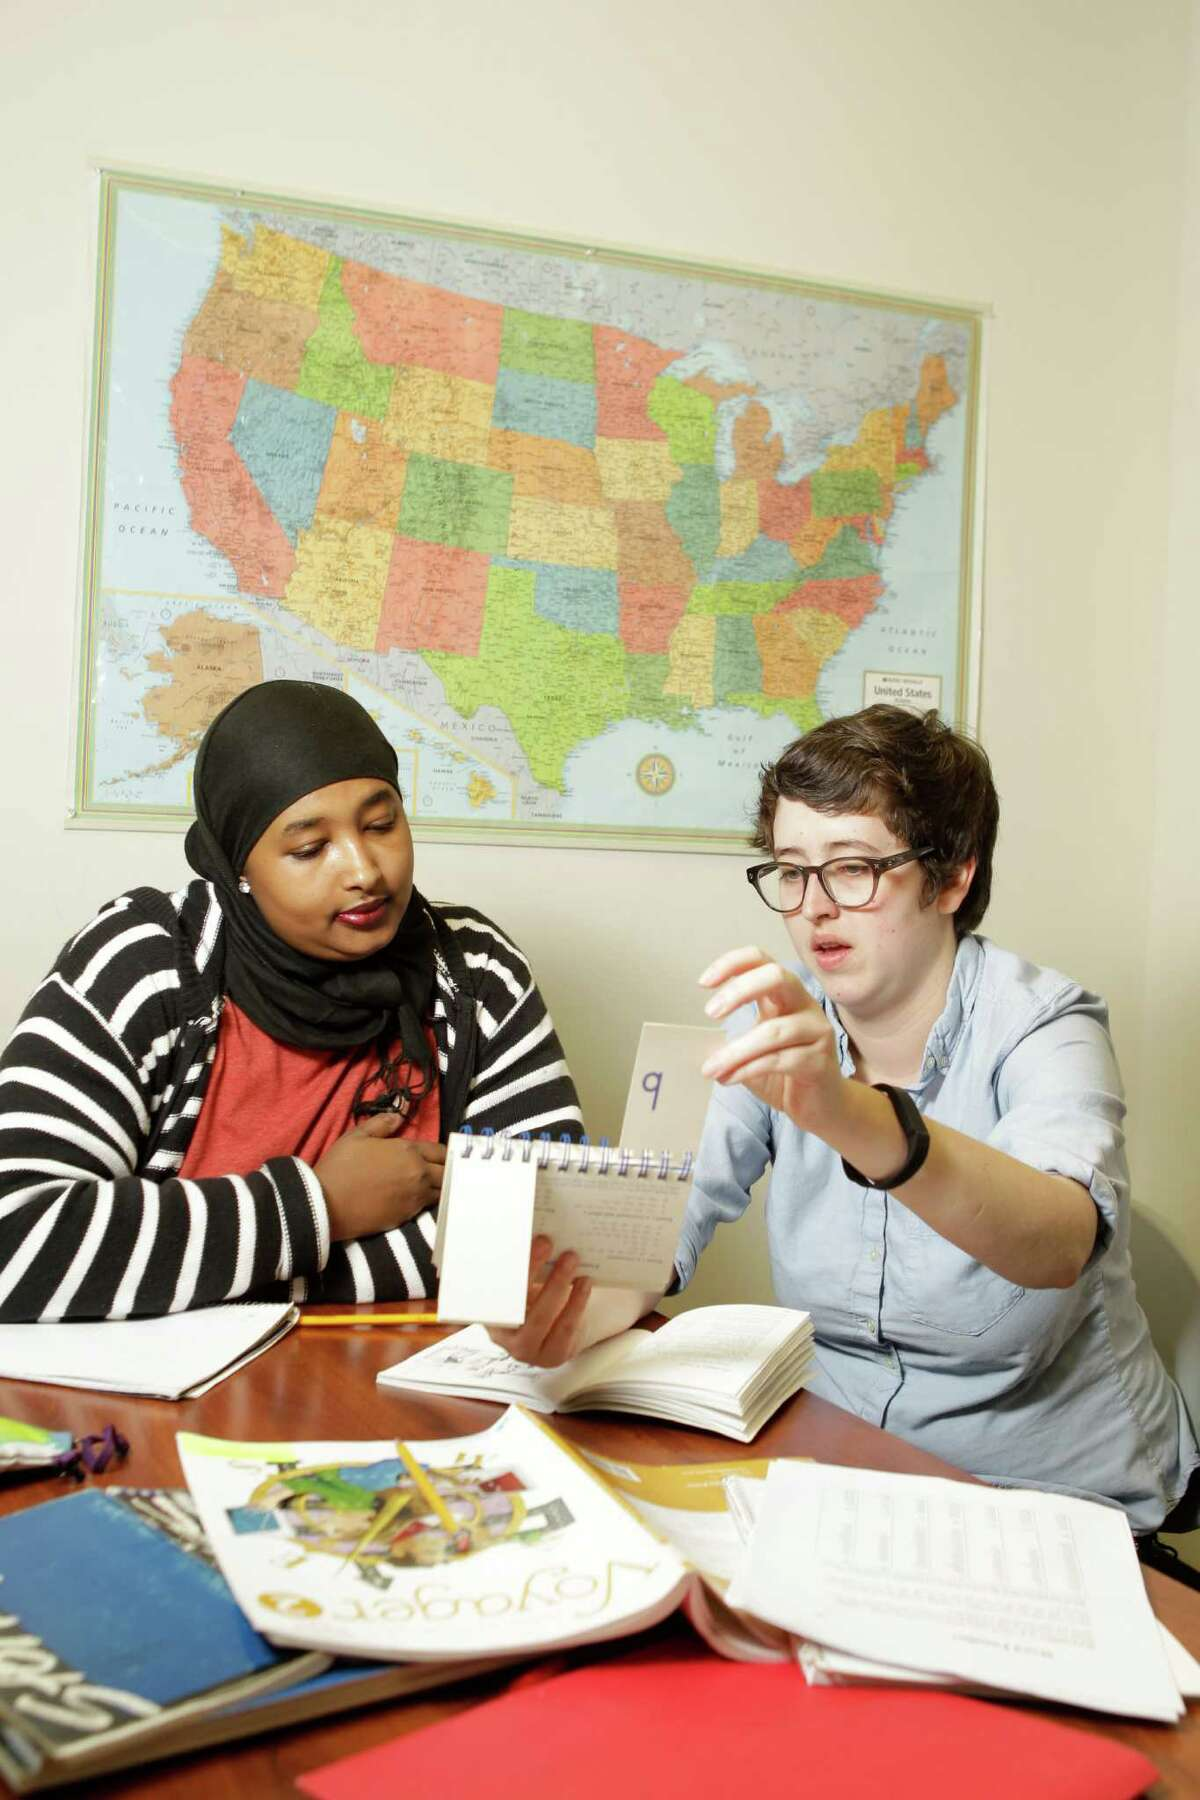 Hasana Hawadleh, left, is tutored by volunteer Brett Hanley at the Literacy Advance of Houston, 2424 Wilcrest Drive, Saturday, Feb. 21, 2015, in Houston. ( Melissa Phillip / Houston Chronicle )